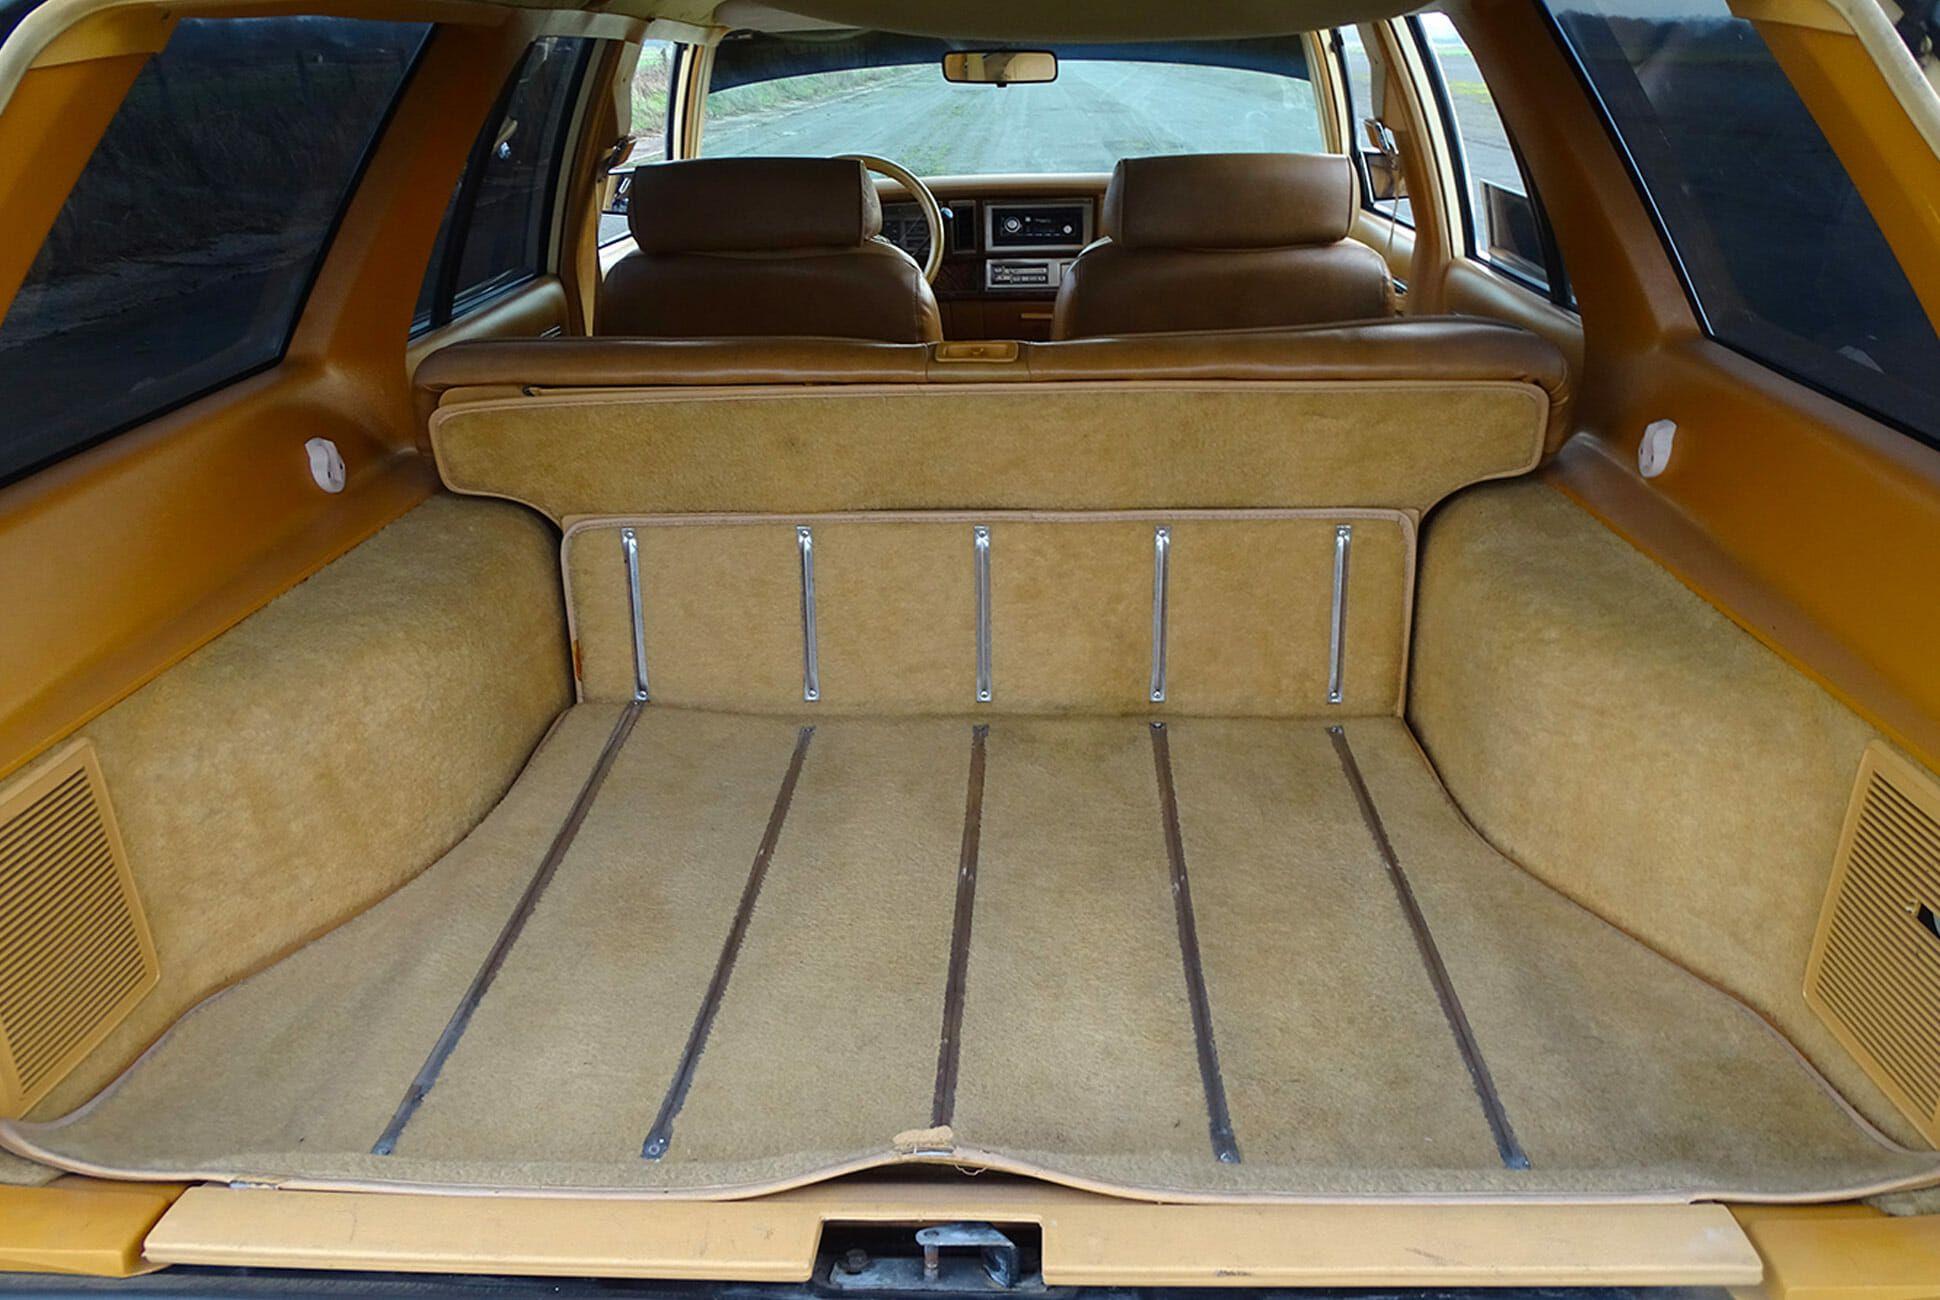 Frank-Sinatra-1985-Chrysler-LeBaron-gear-patrol-slide-5